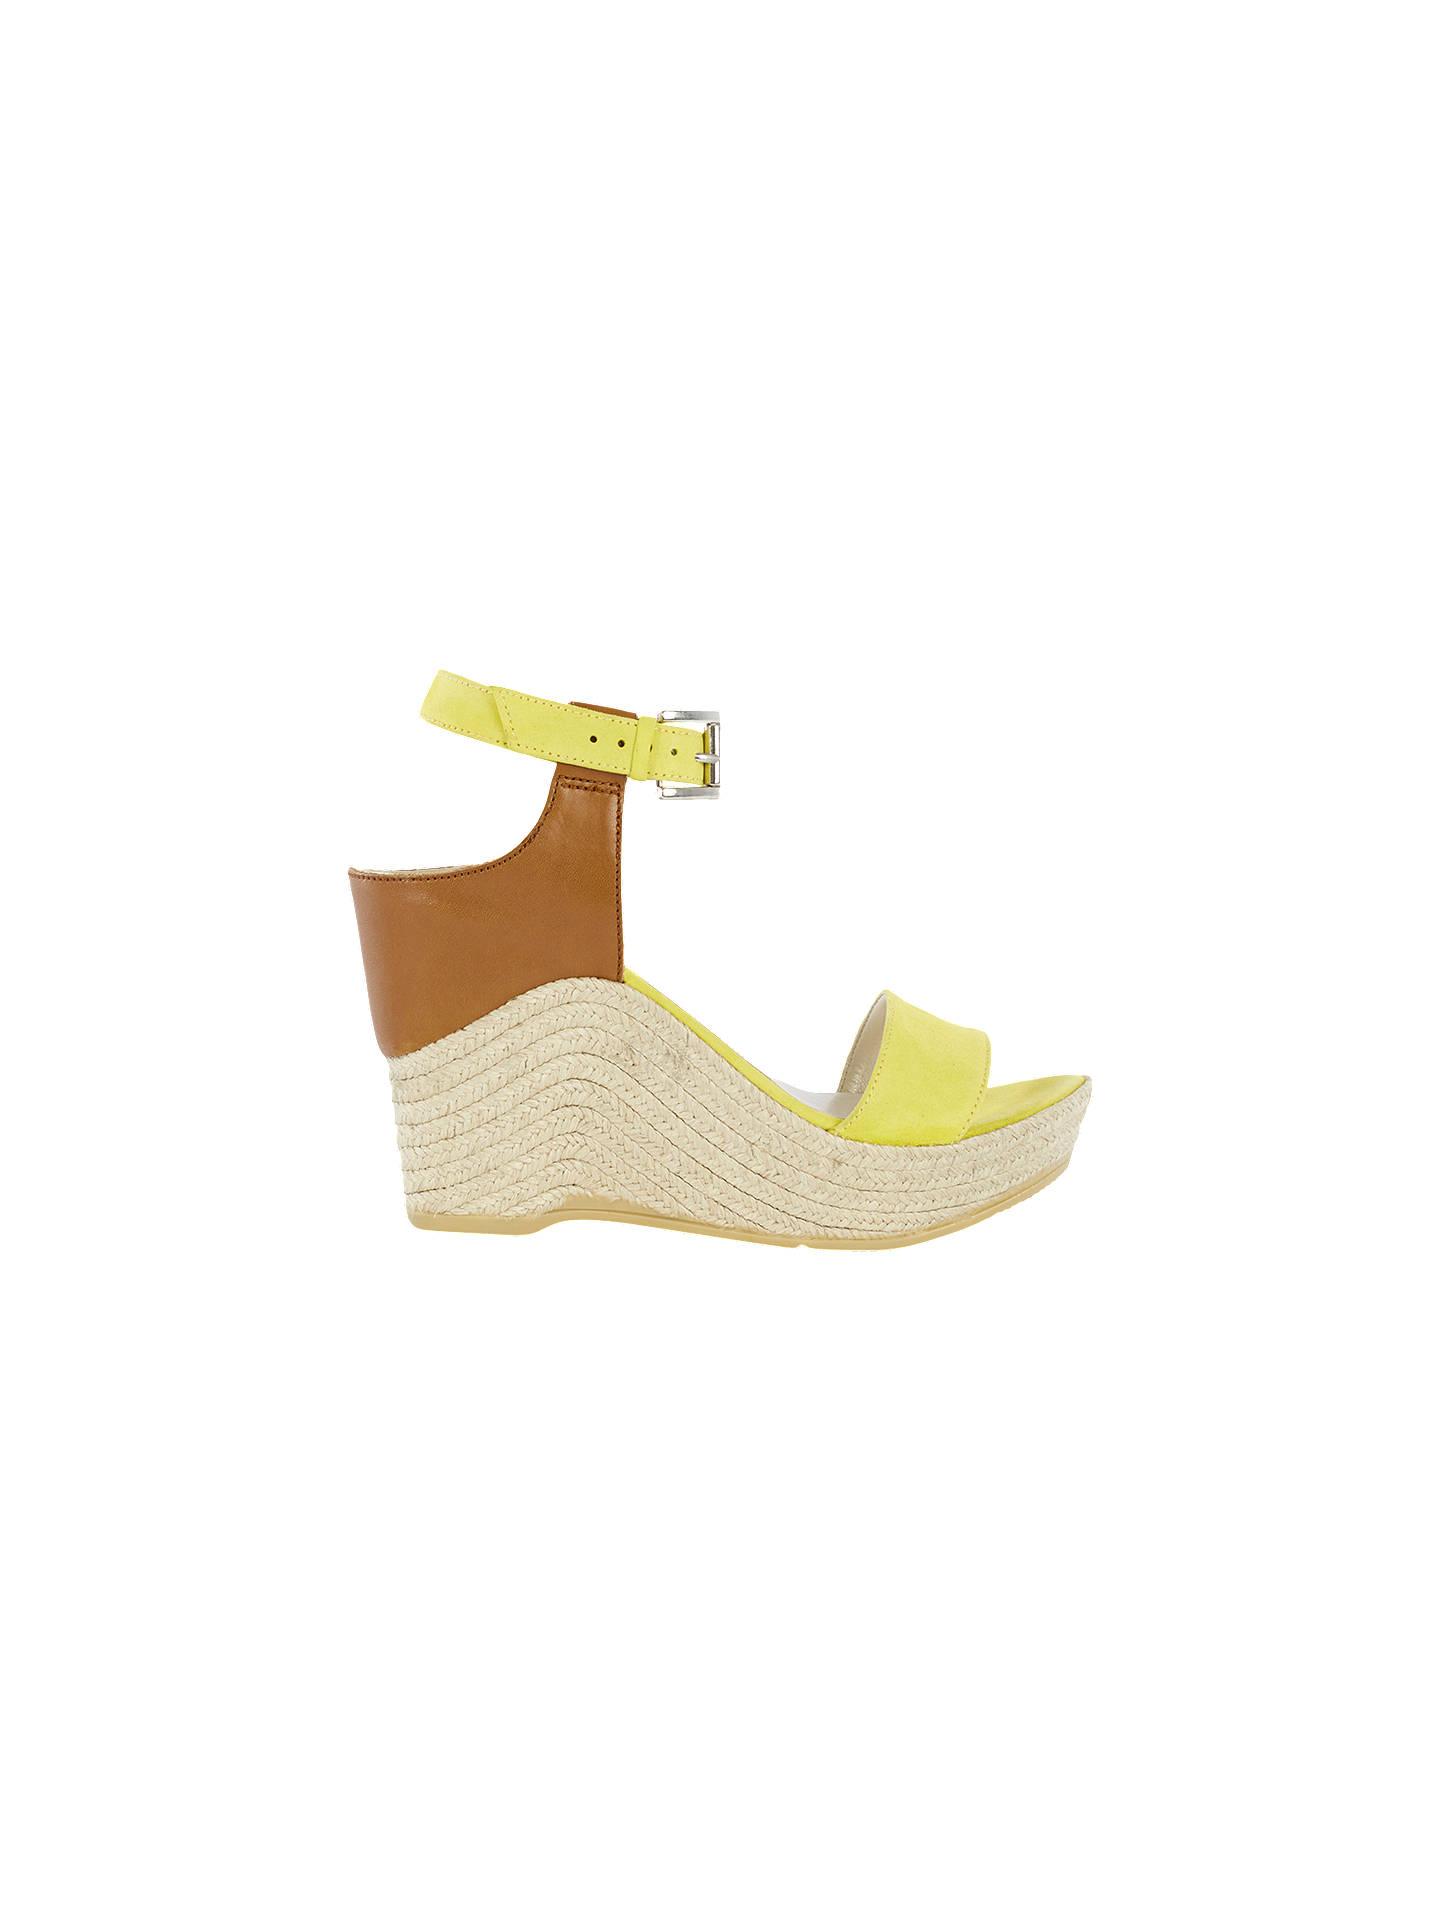 8cefded32d1 Karen Millen Wedge Heeled Espadrille Sandals, Yellow at John Lewis ...